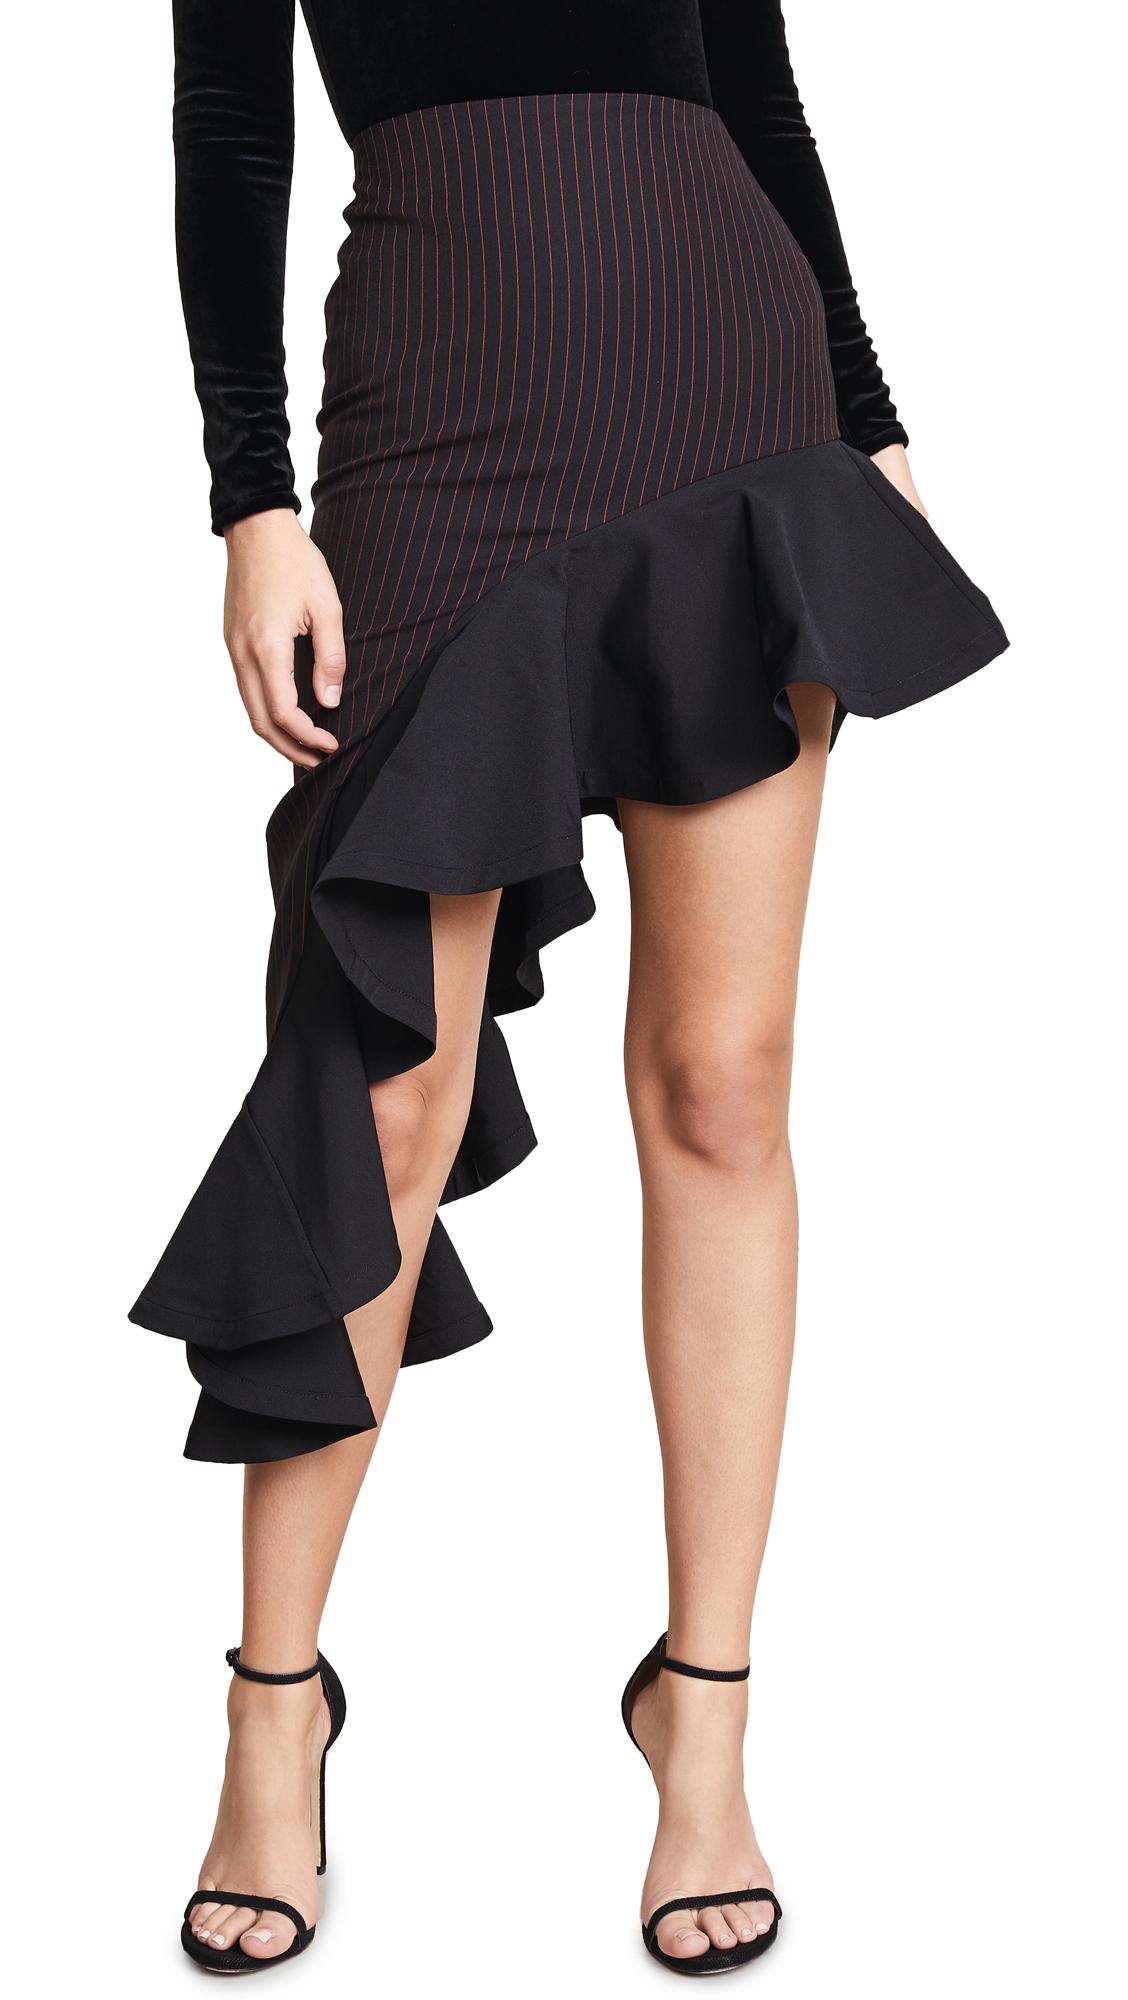 VATANIKA Asymmetrical Ruffle Hem Skirt in Black